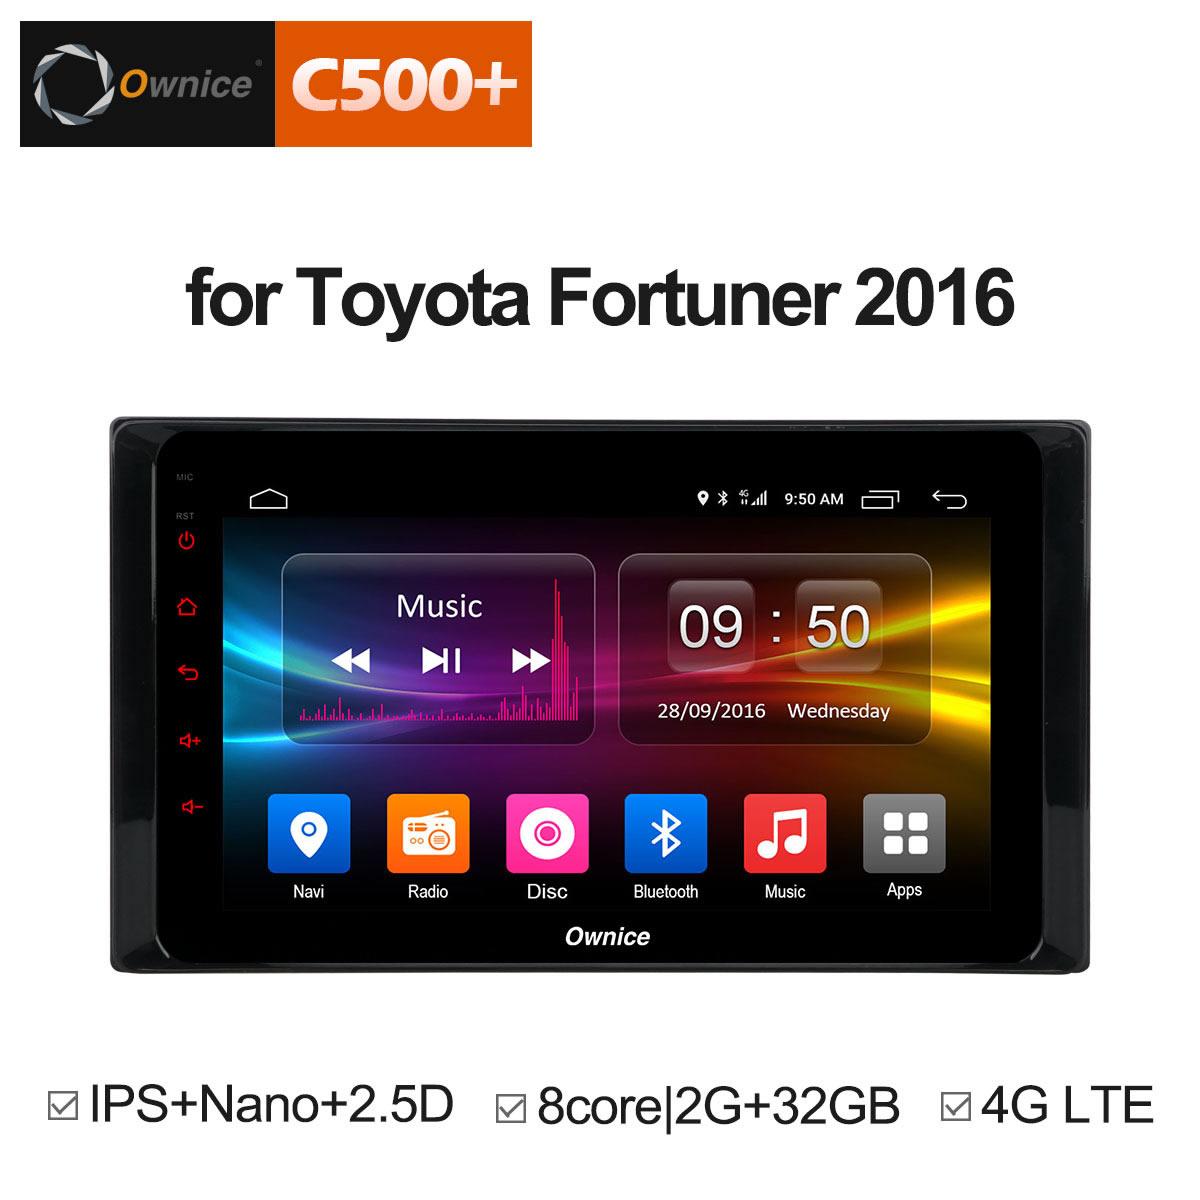 цена на Ownce C500+ G10 Radio 8 Core Car DVD Android 8.1 for Toyota RAV4 Hilux Fortuner Innova Prado 2016 GPS Navigation Vedio Player 4G